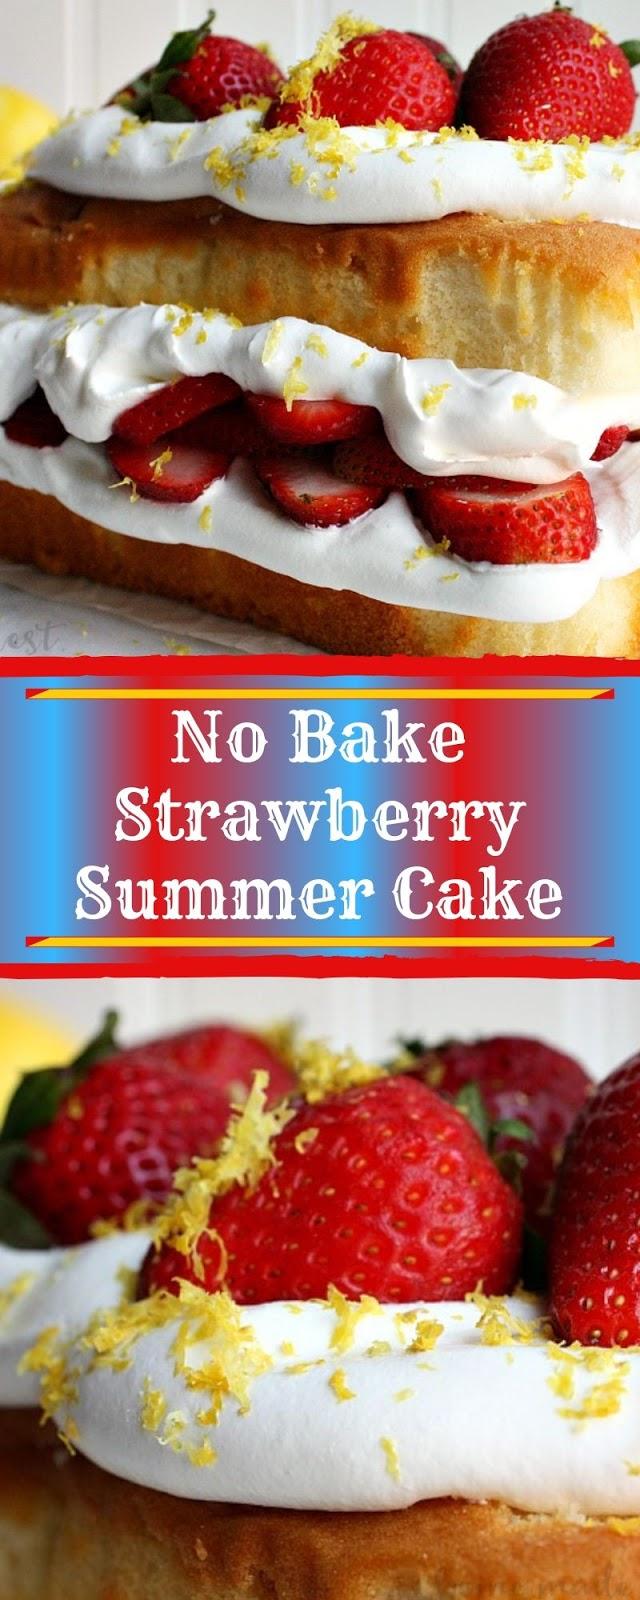 No Bake Strawberry Summer Cake